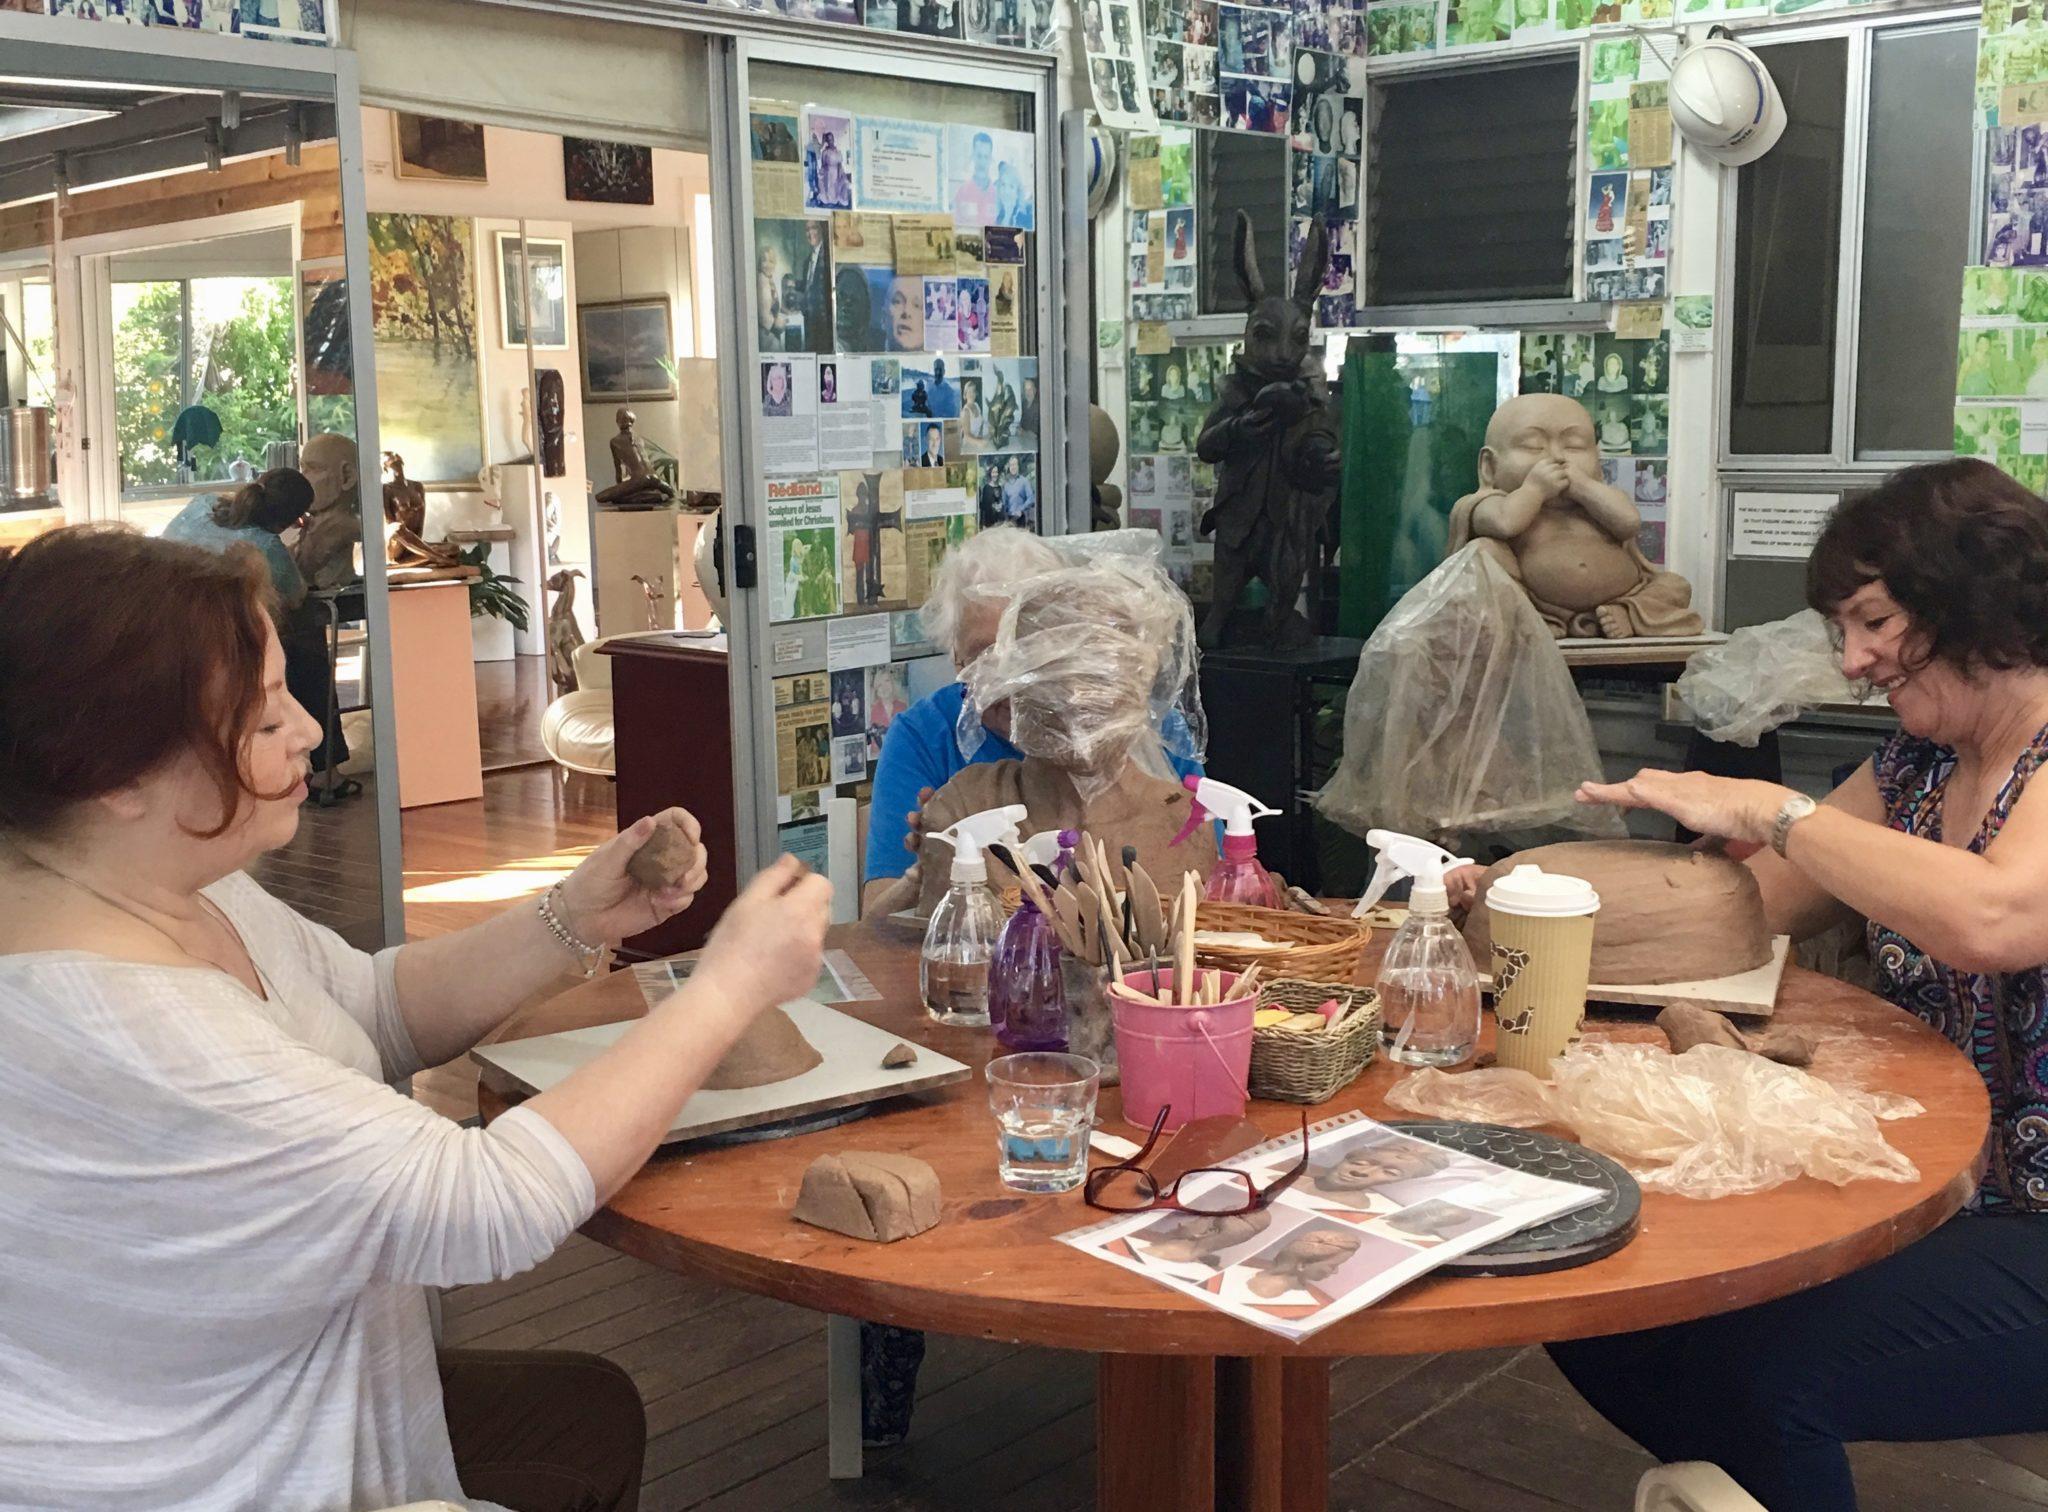 Art sculpture class in Birkdale